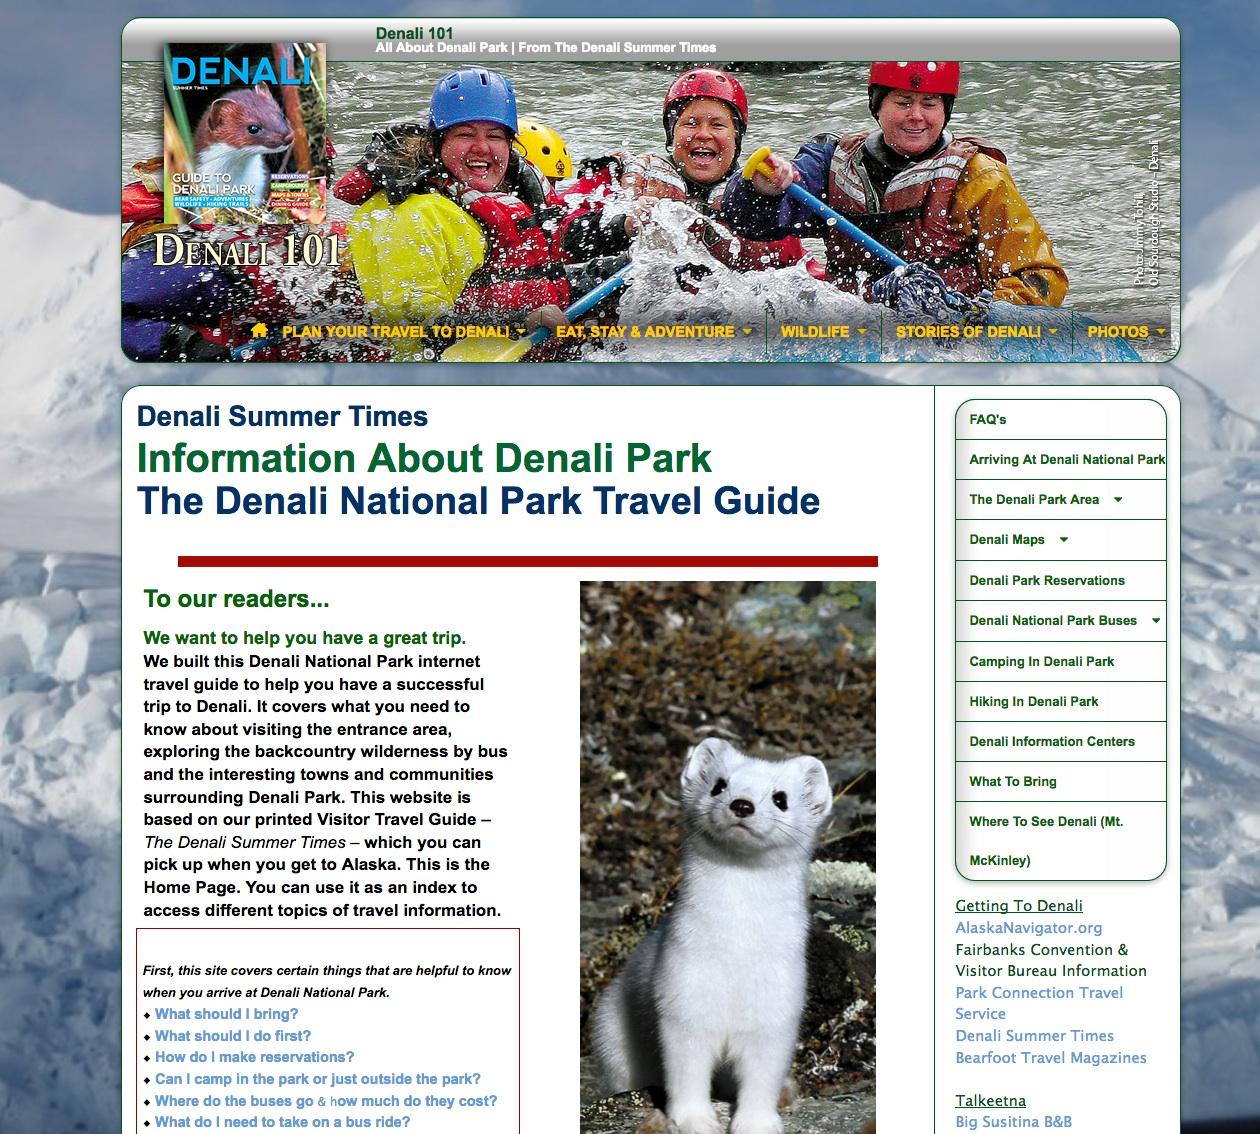 Denali Summer Times Site